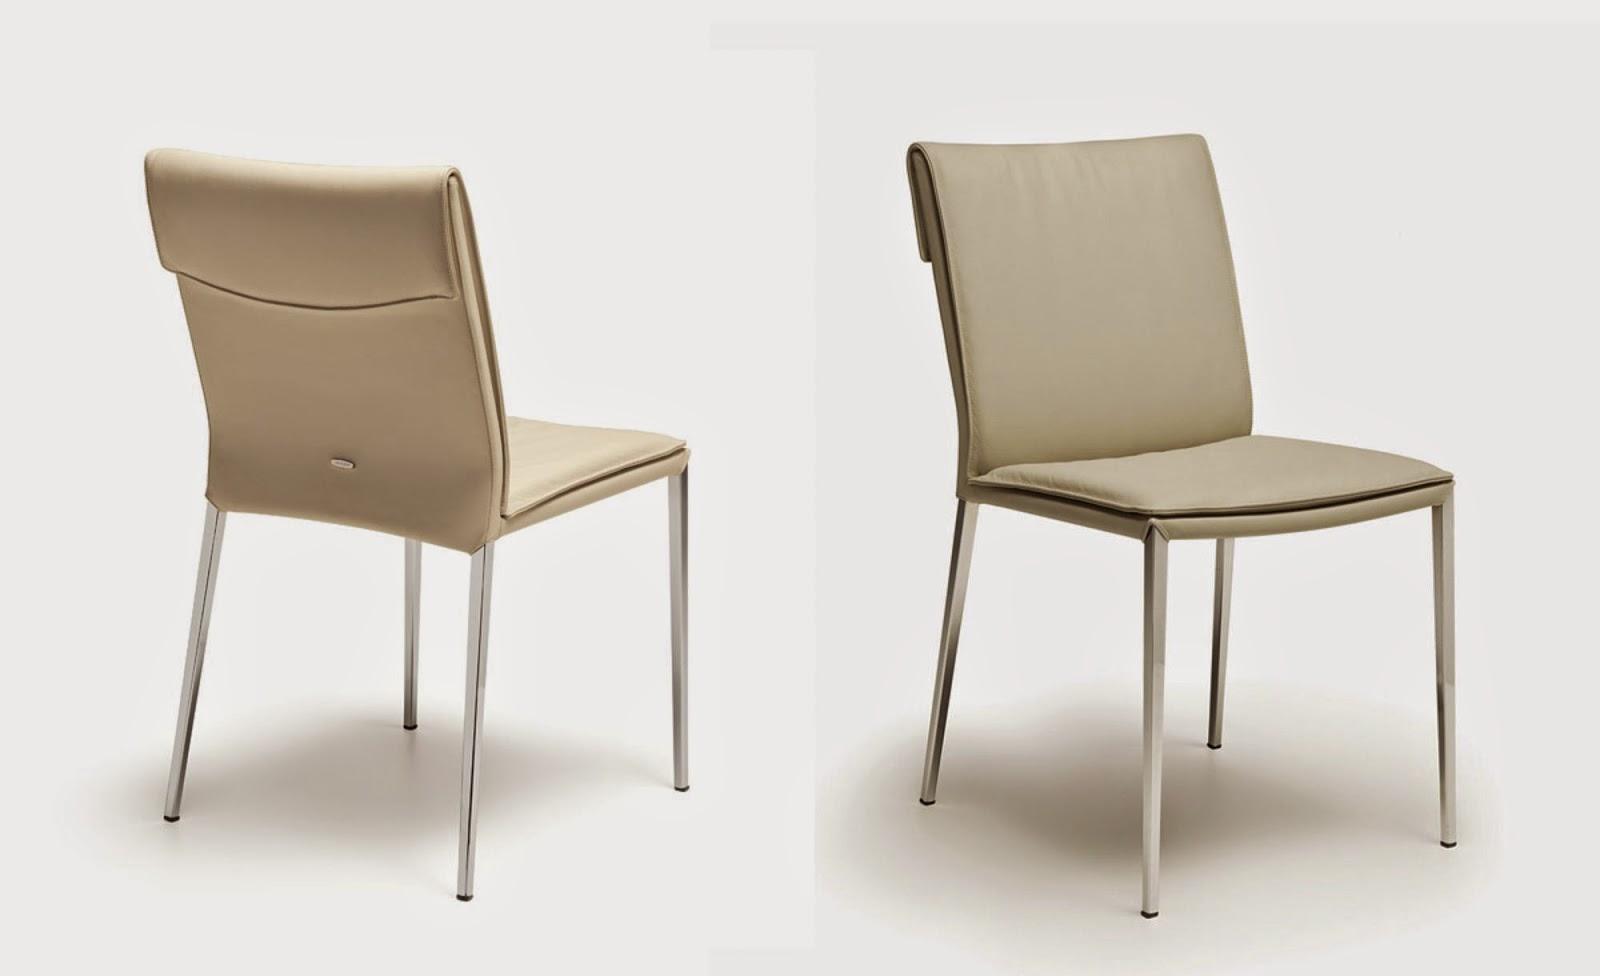 chair isabel ml cattelan italia italian furniture. Black Bedroom Furniture Sets. Home Design Ideas